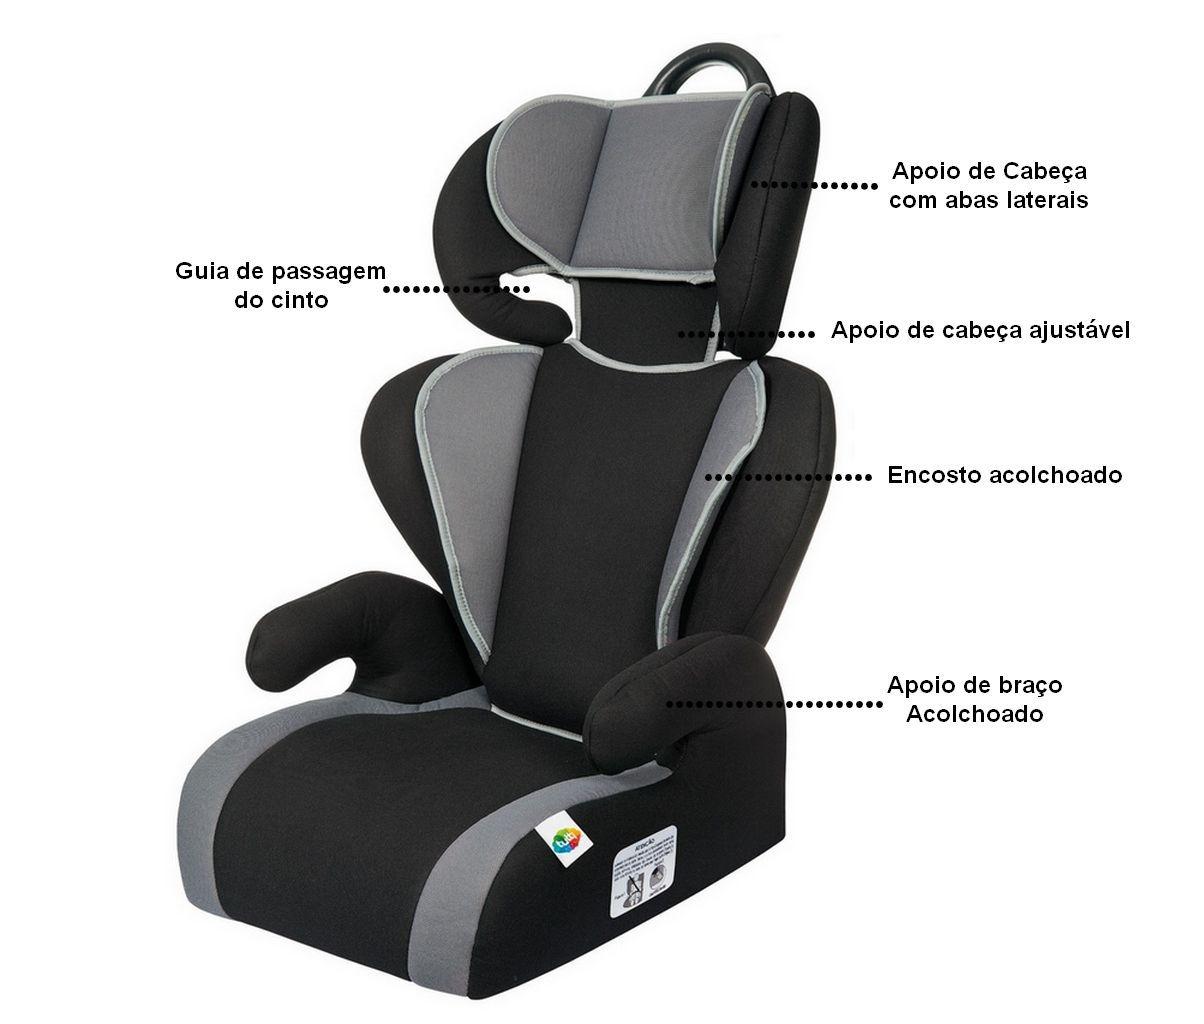 Cadeirinha De Carro Preto E Cinza Para Menino Menina Safety e Comfort Tutti Baby